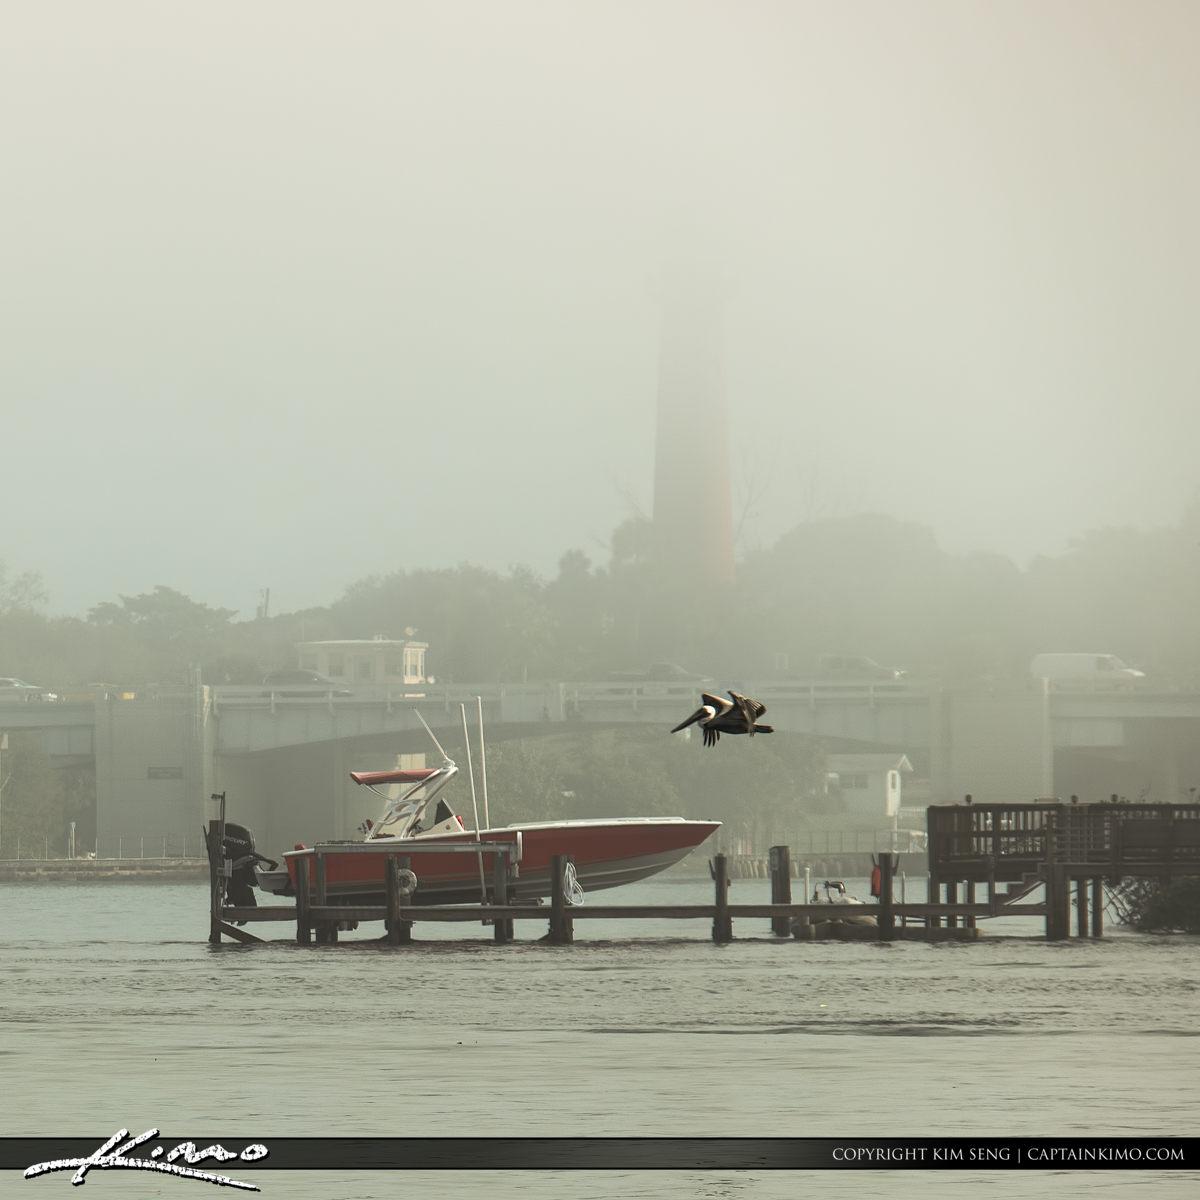 Jupiter Lighthouse US 1 Bridge Fog Pelican